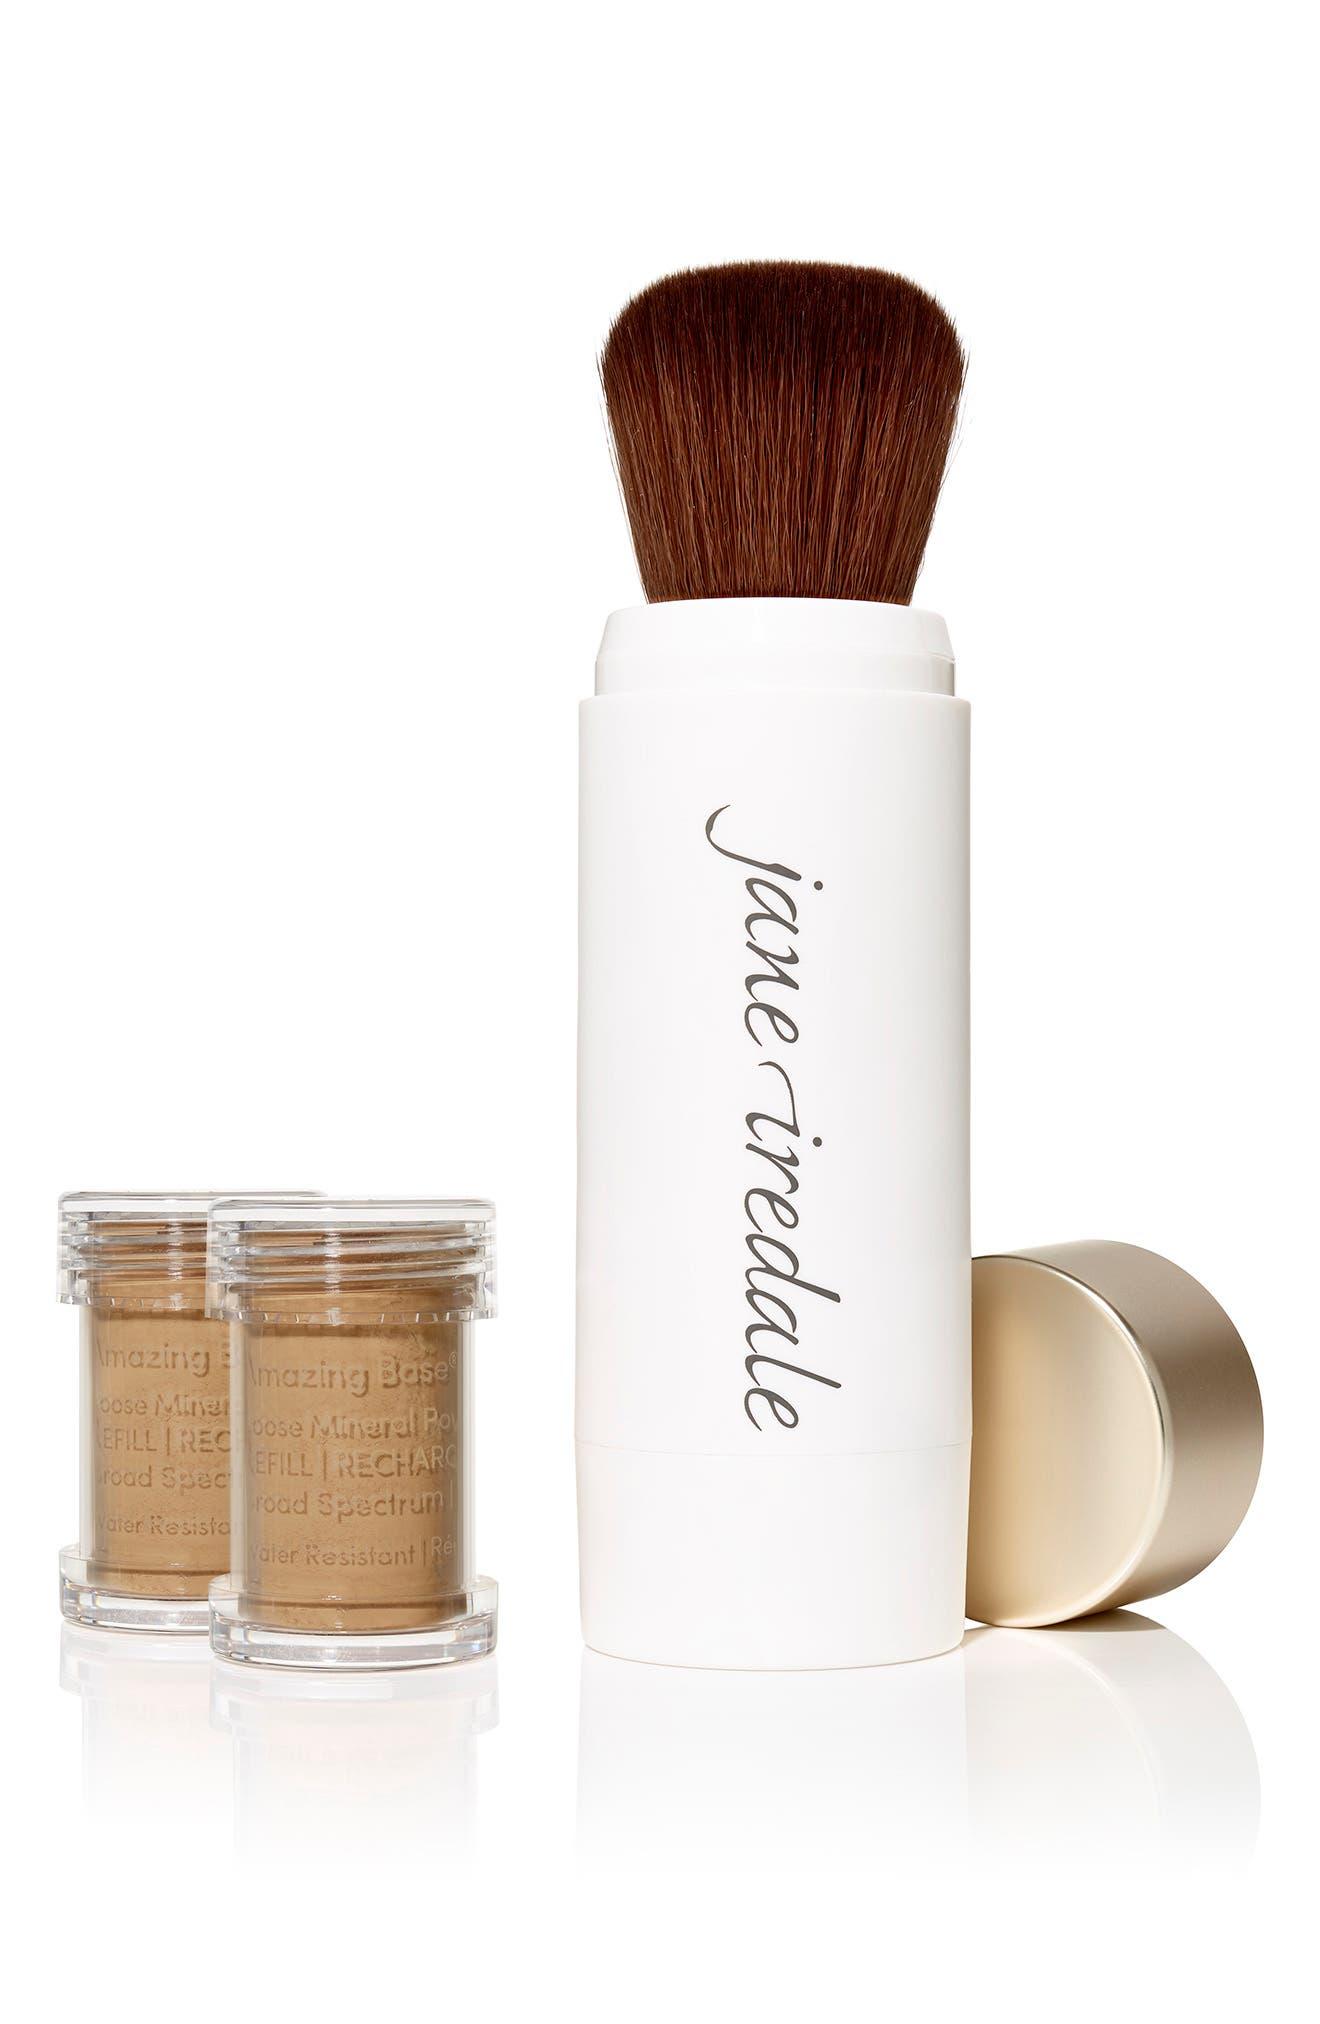 Amazing Base Loose Mineral Powder Spf 20 Refillable Brush